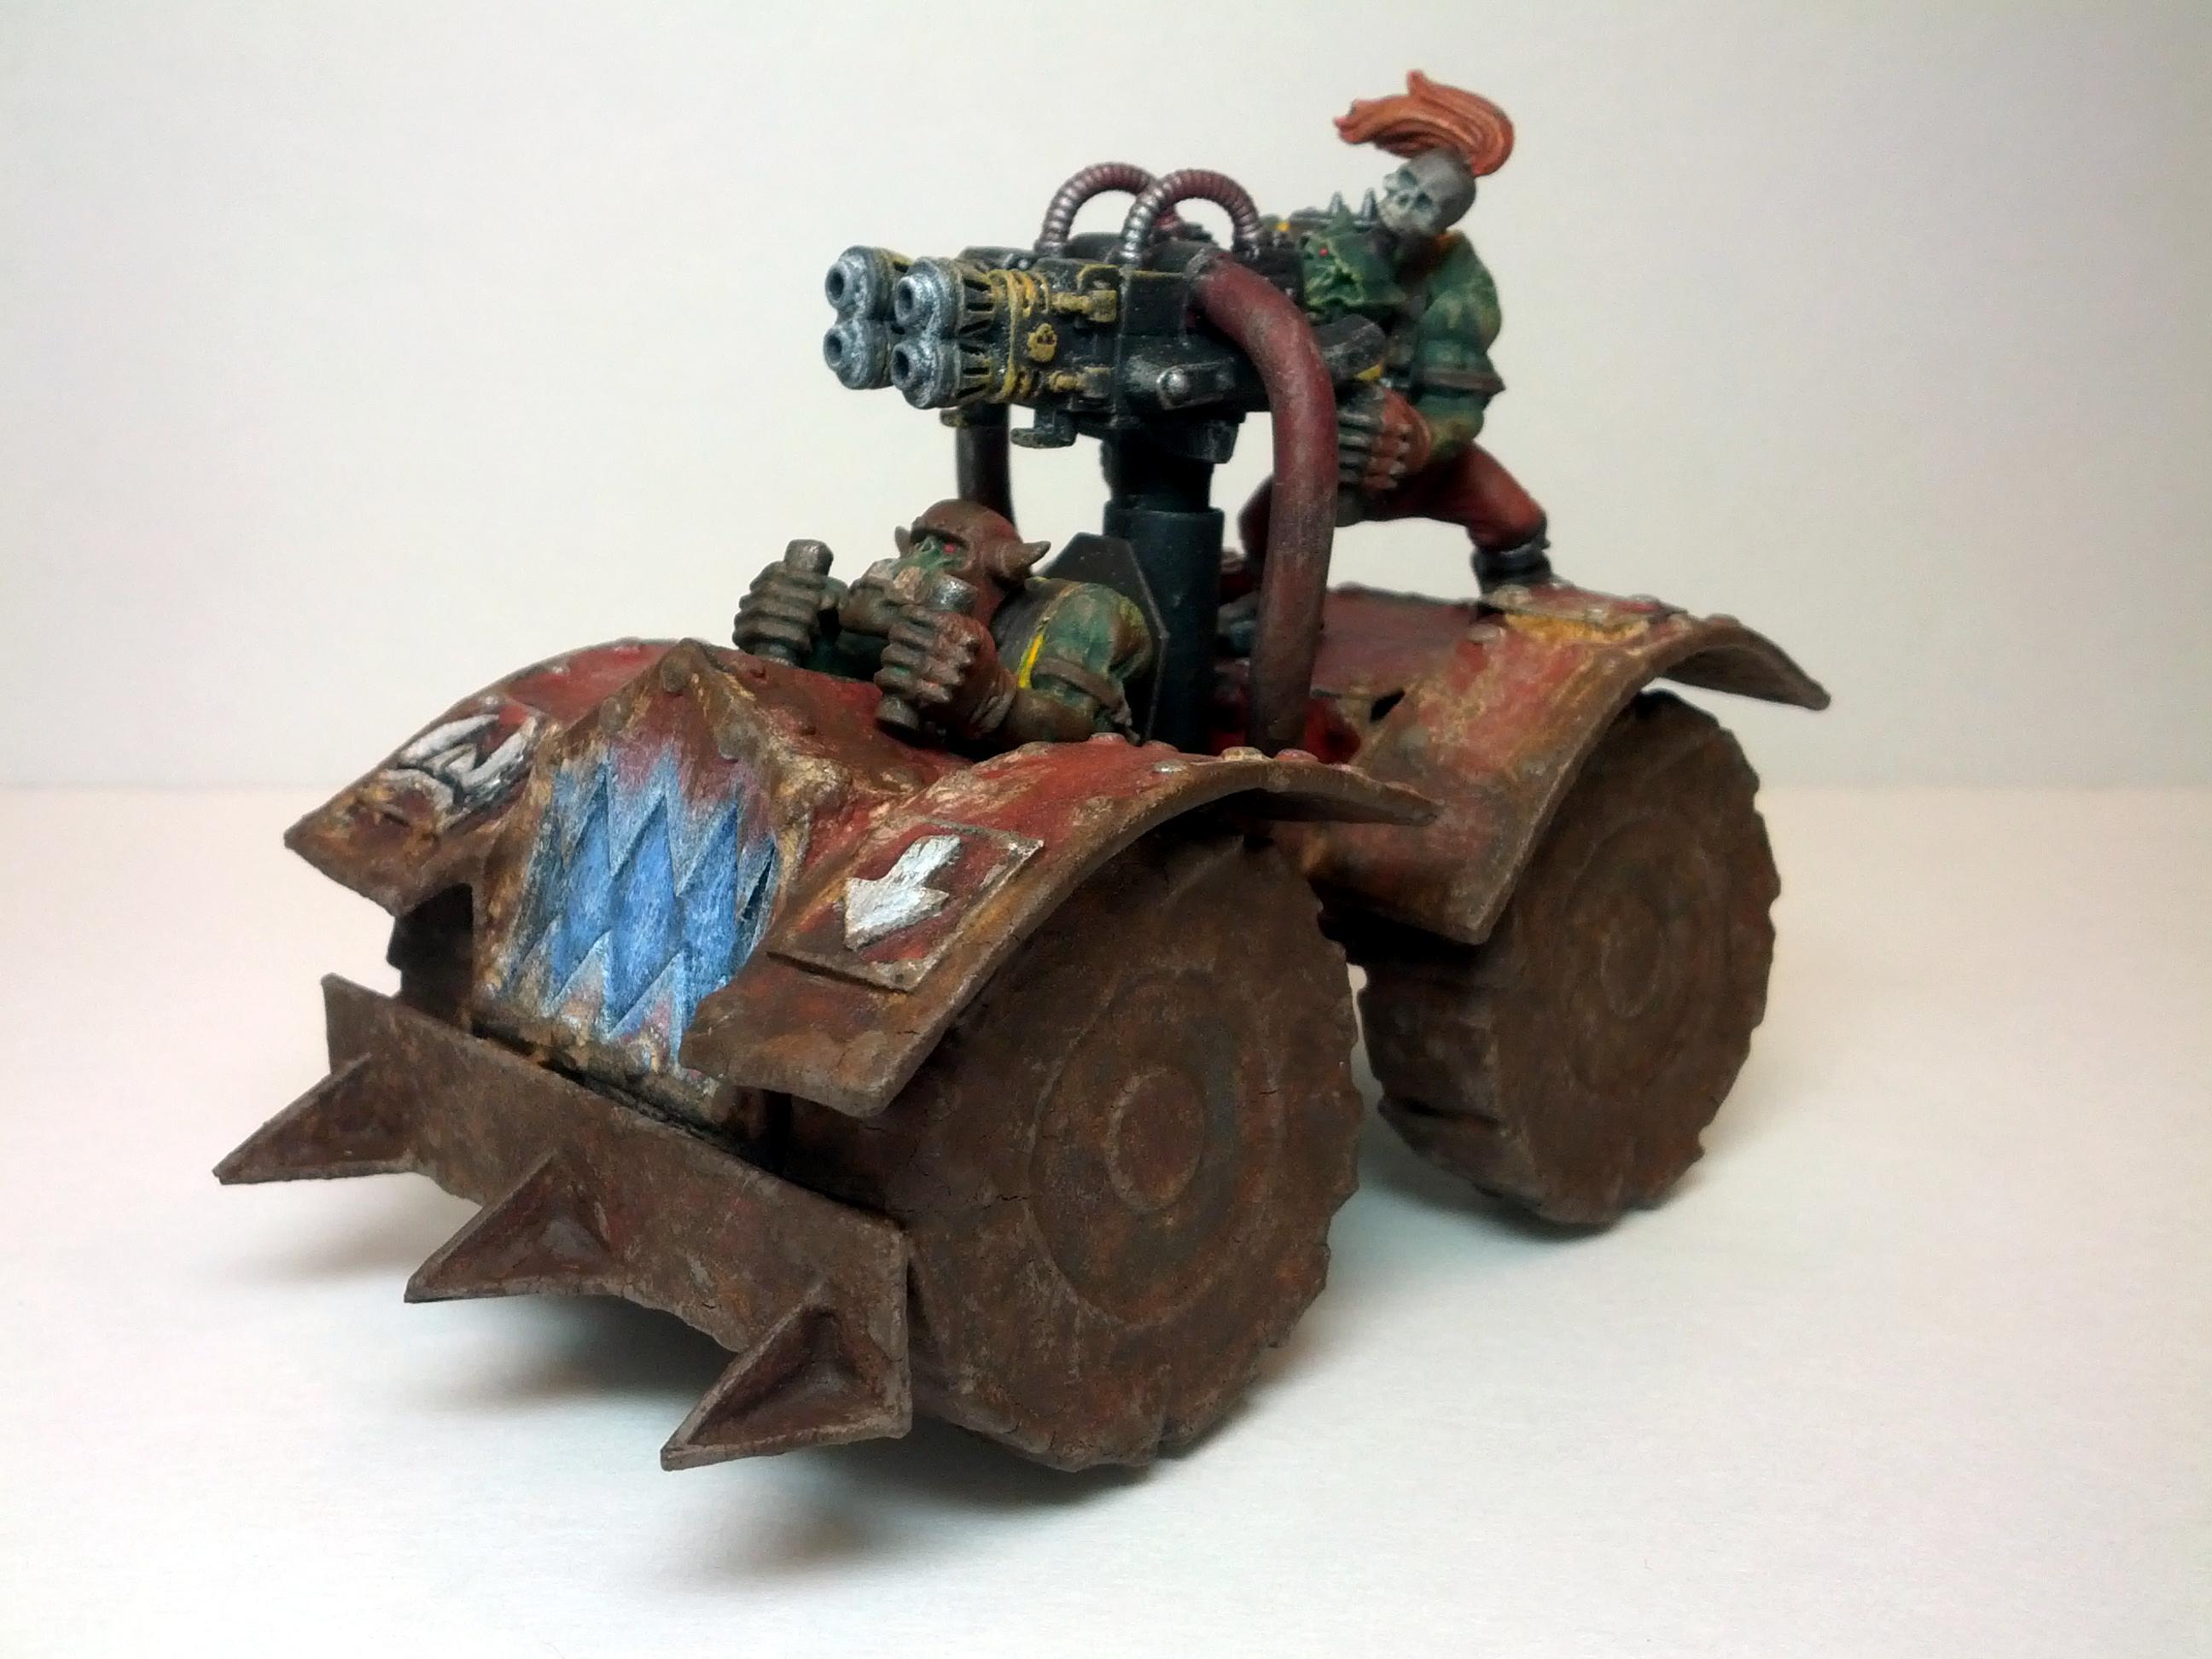 Mud, Orks, Plasma Effect, Scratch Build, Skorcha, Skorcha Buggy, Warbuggy, Warhammer 40,000, Weathered